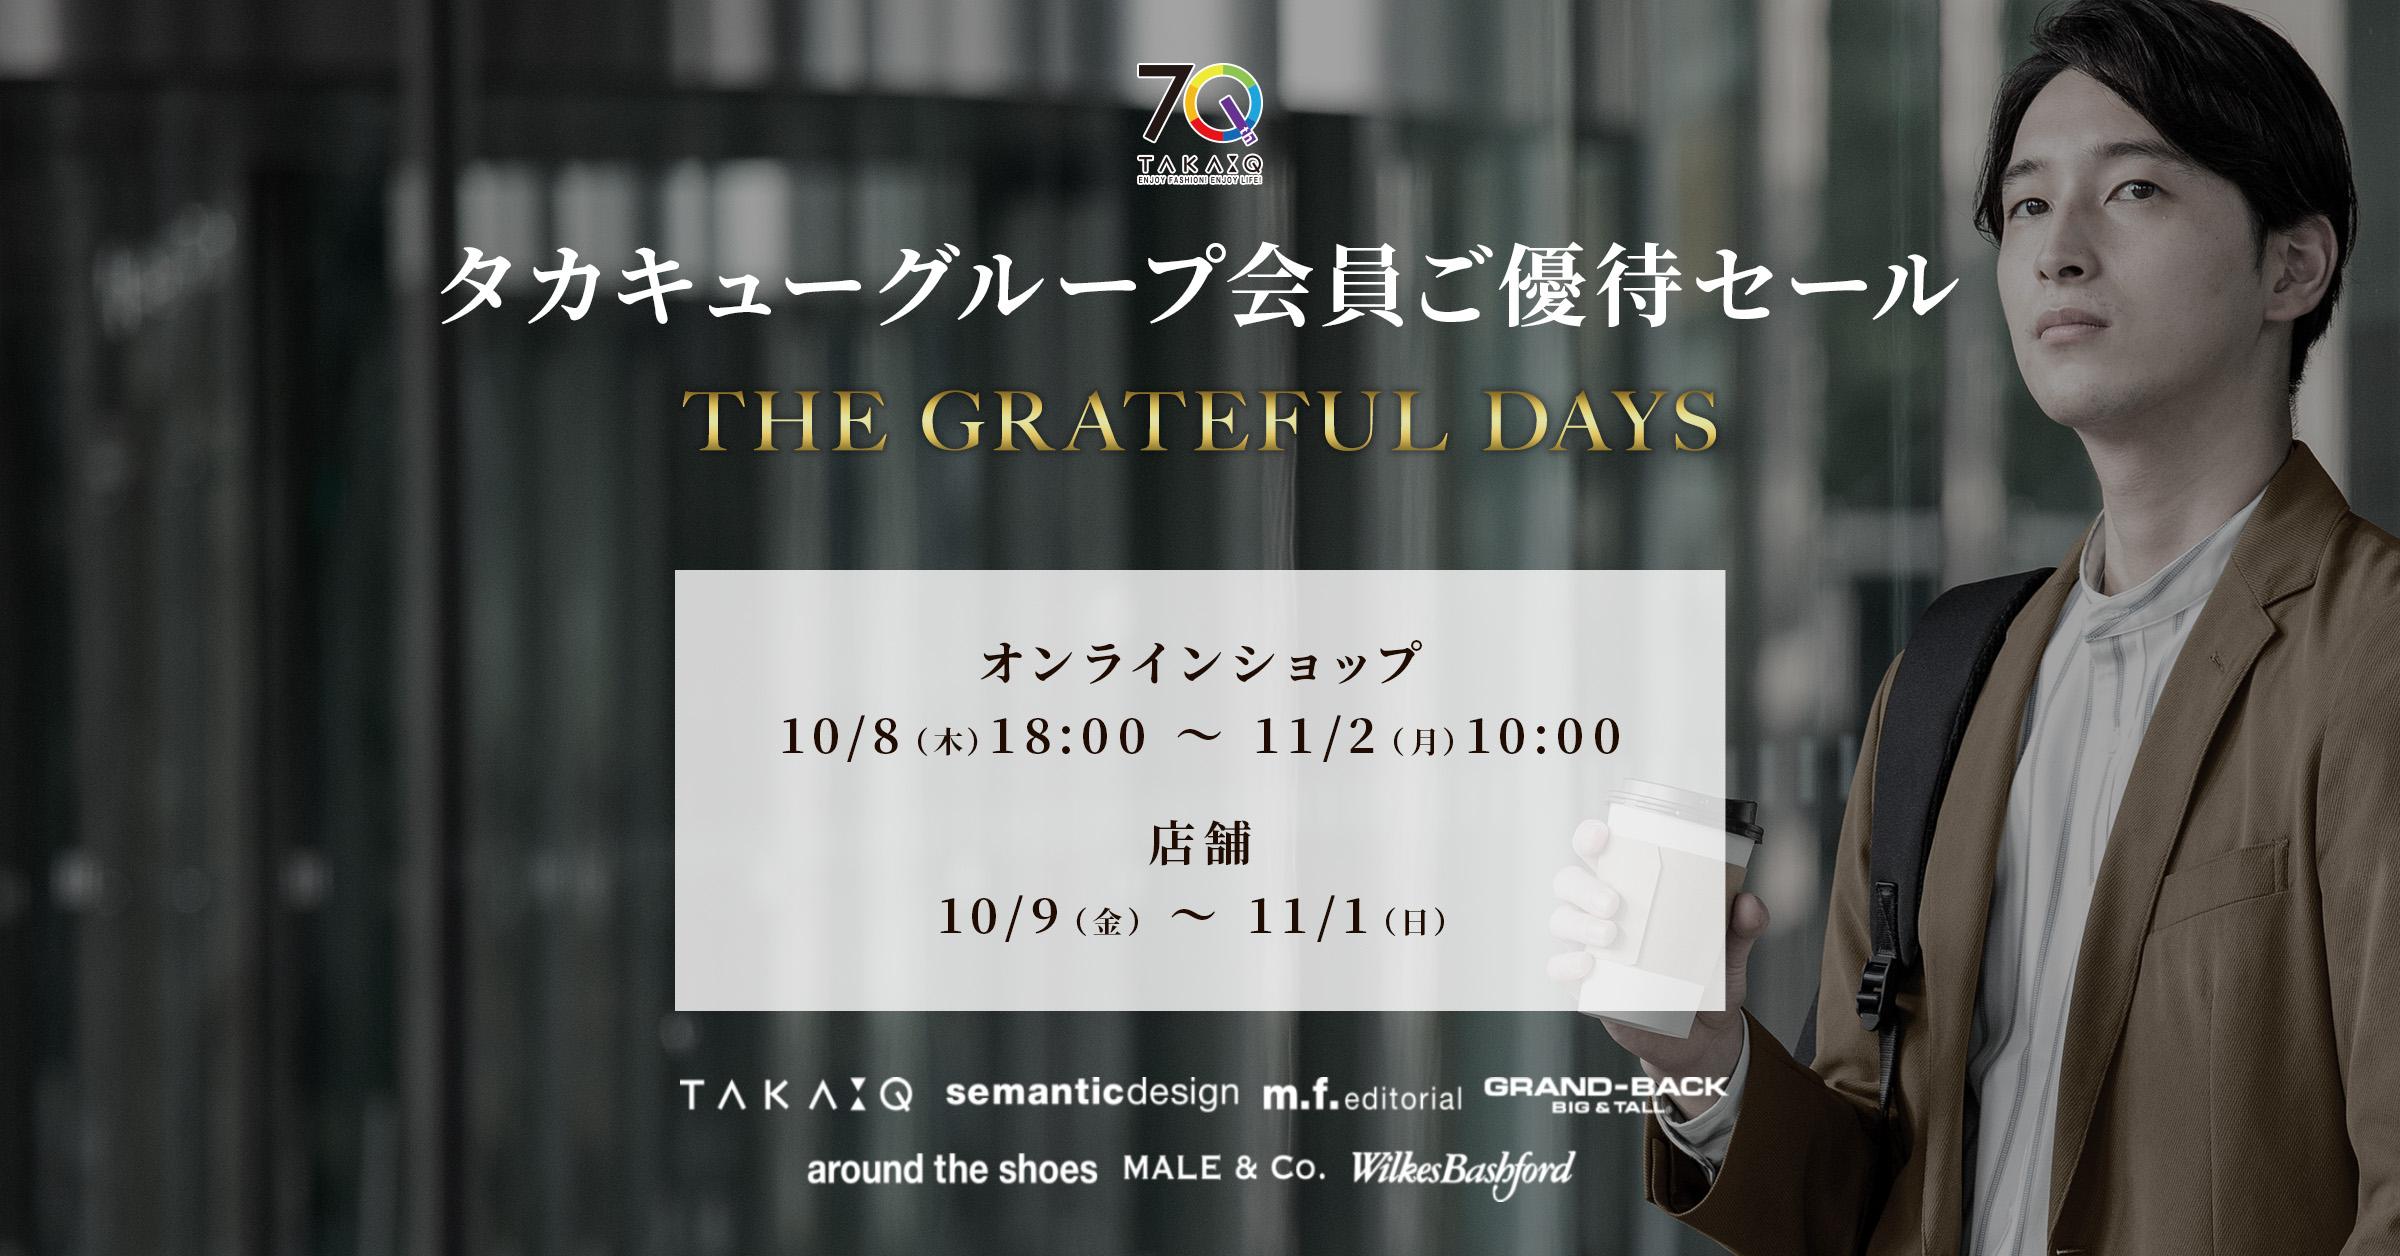 THE GRATEFUL DAYS